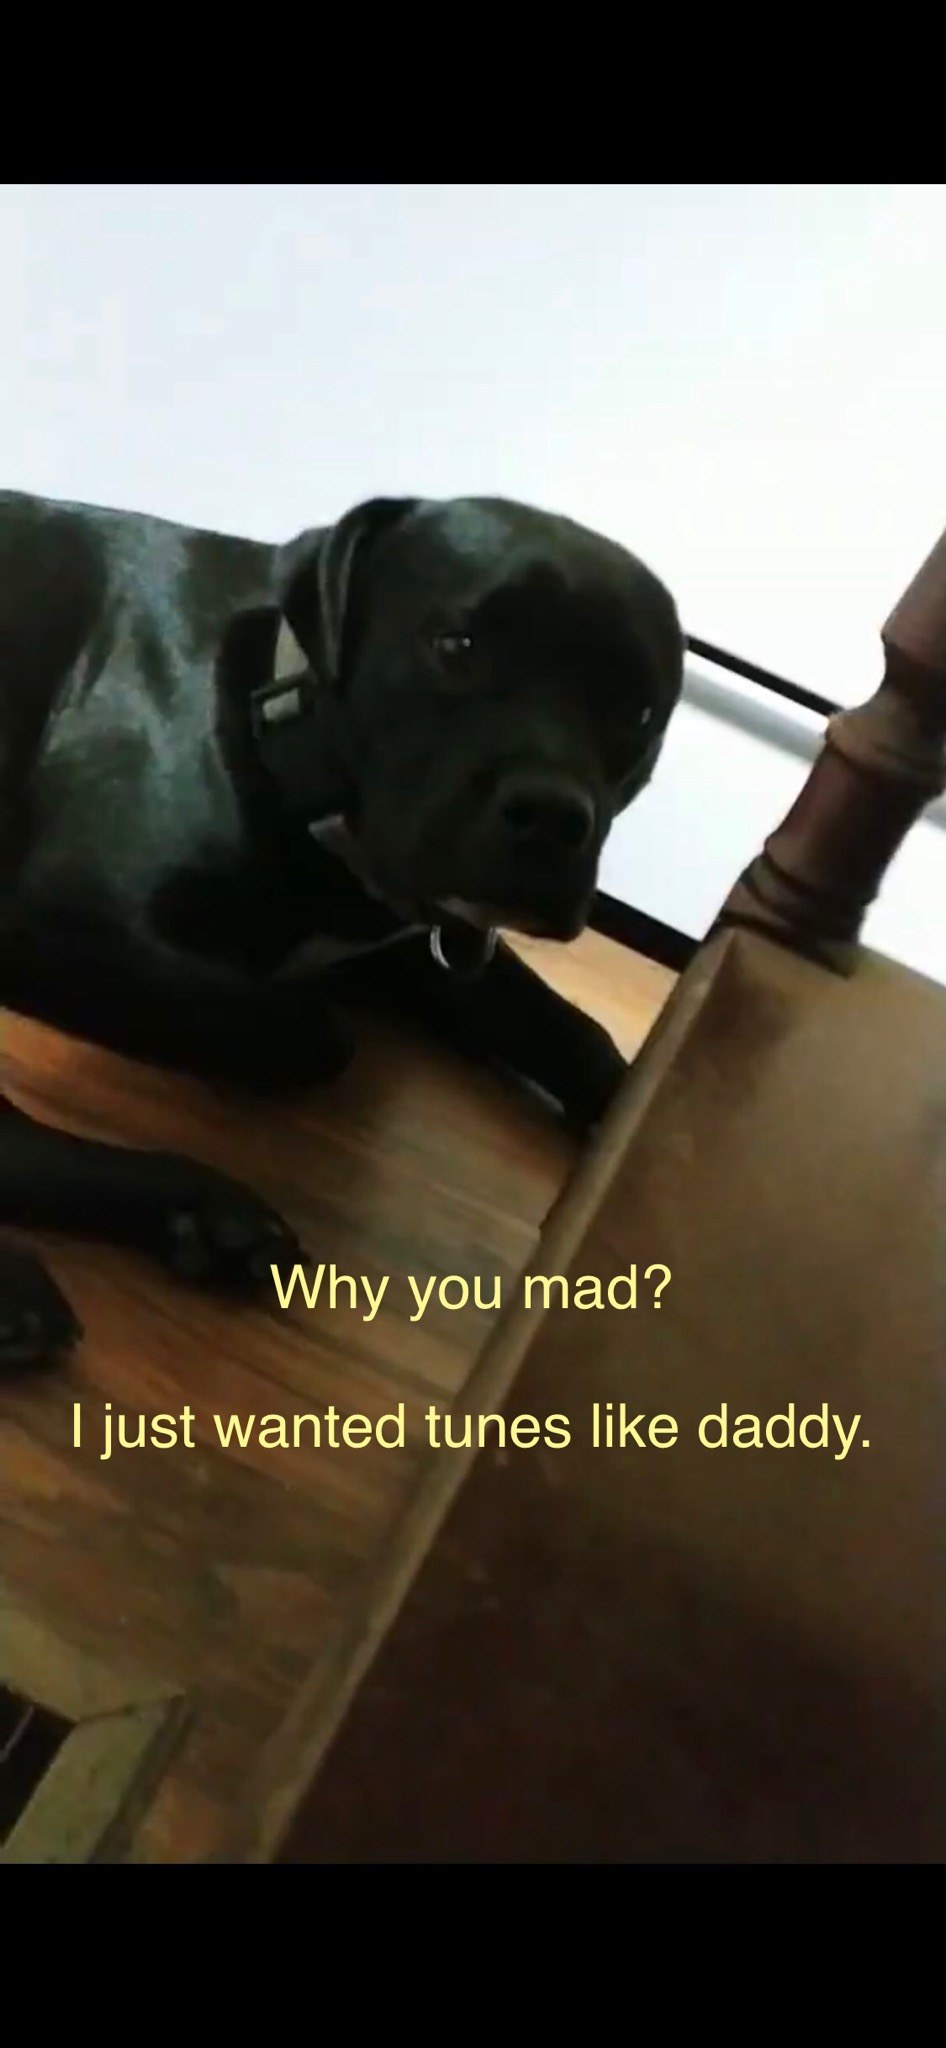 Dog who chewed vinyl records